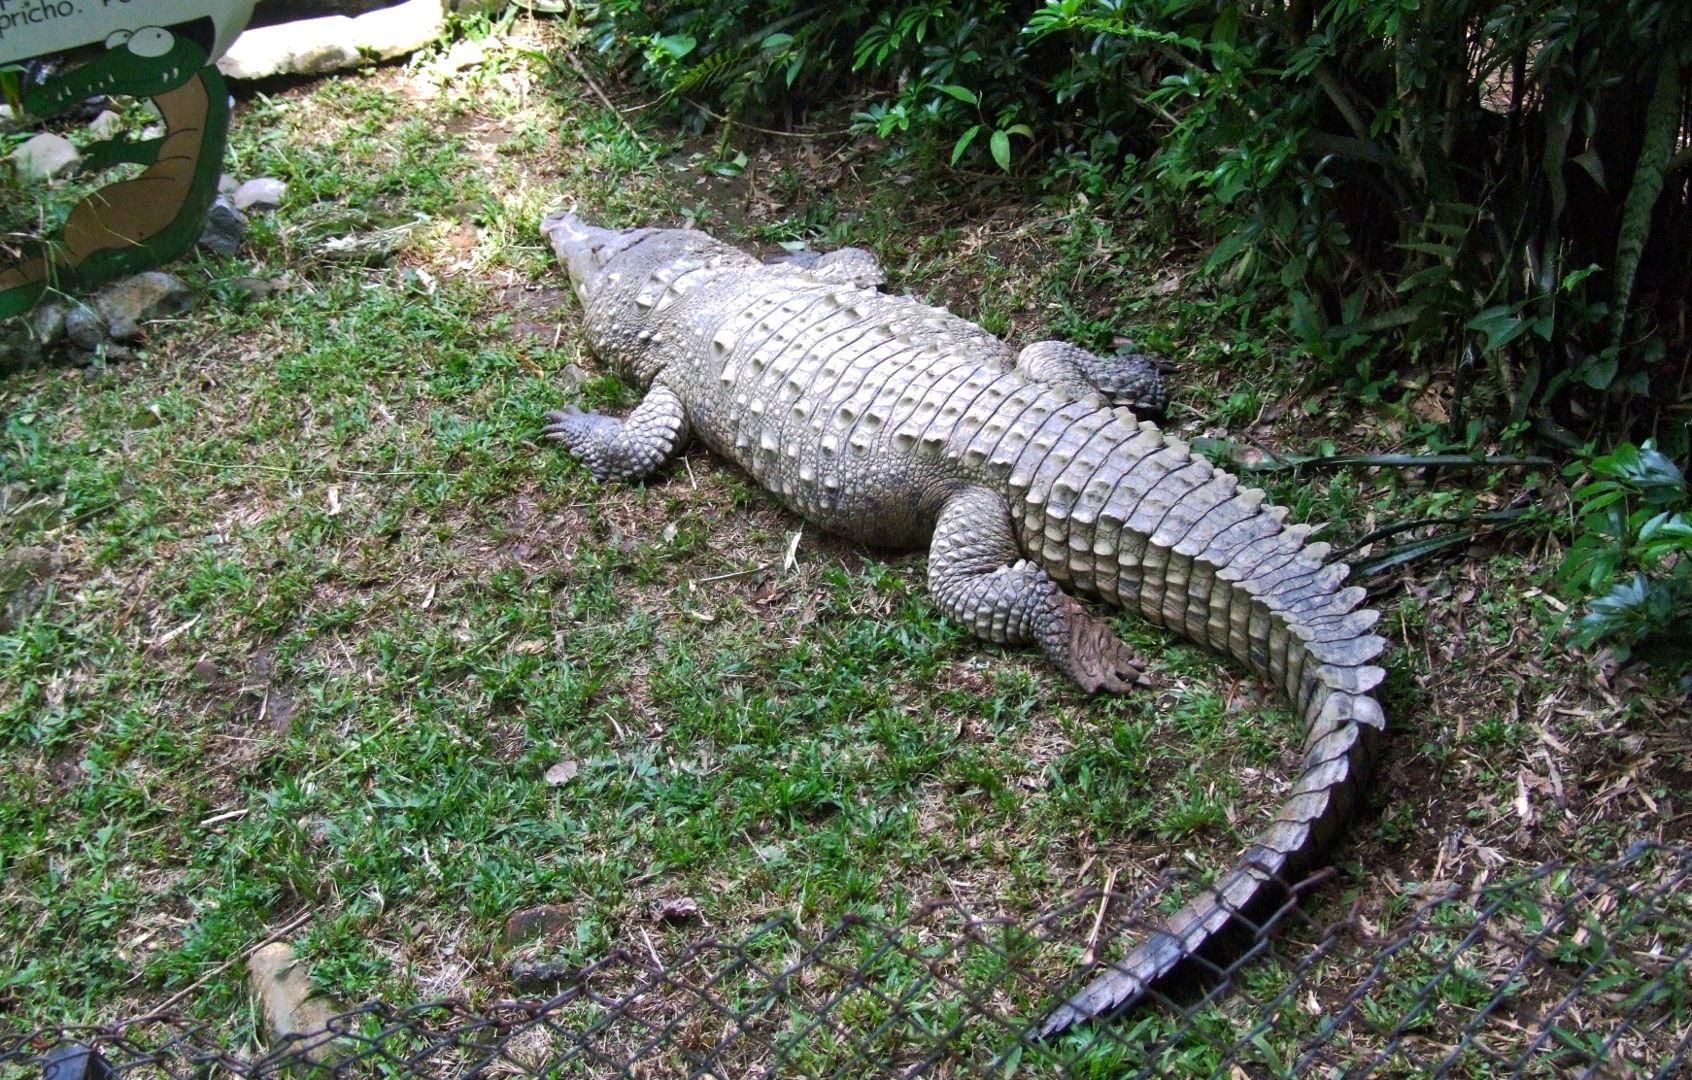 Crocodile in Zoo Ave park